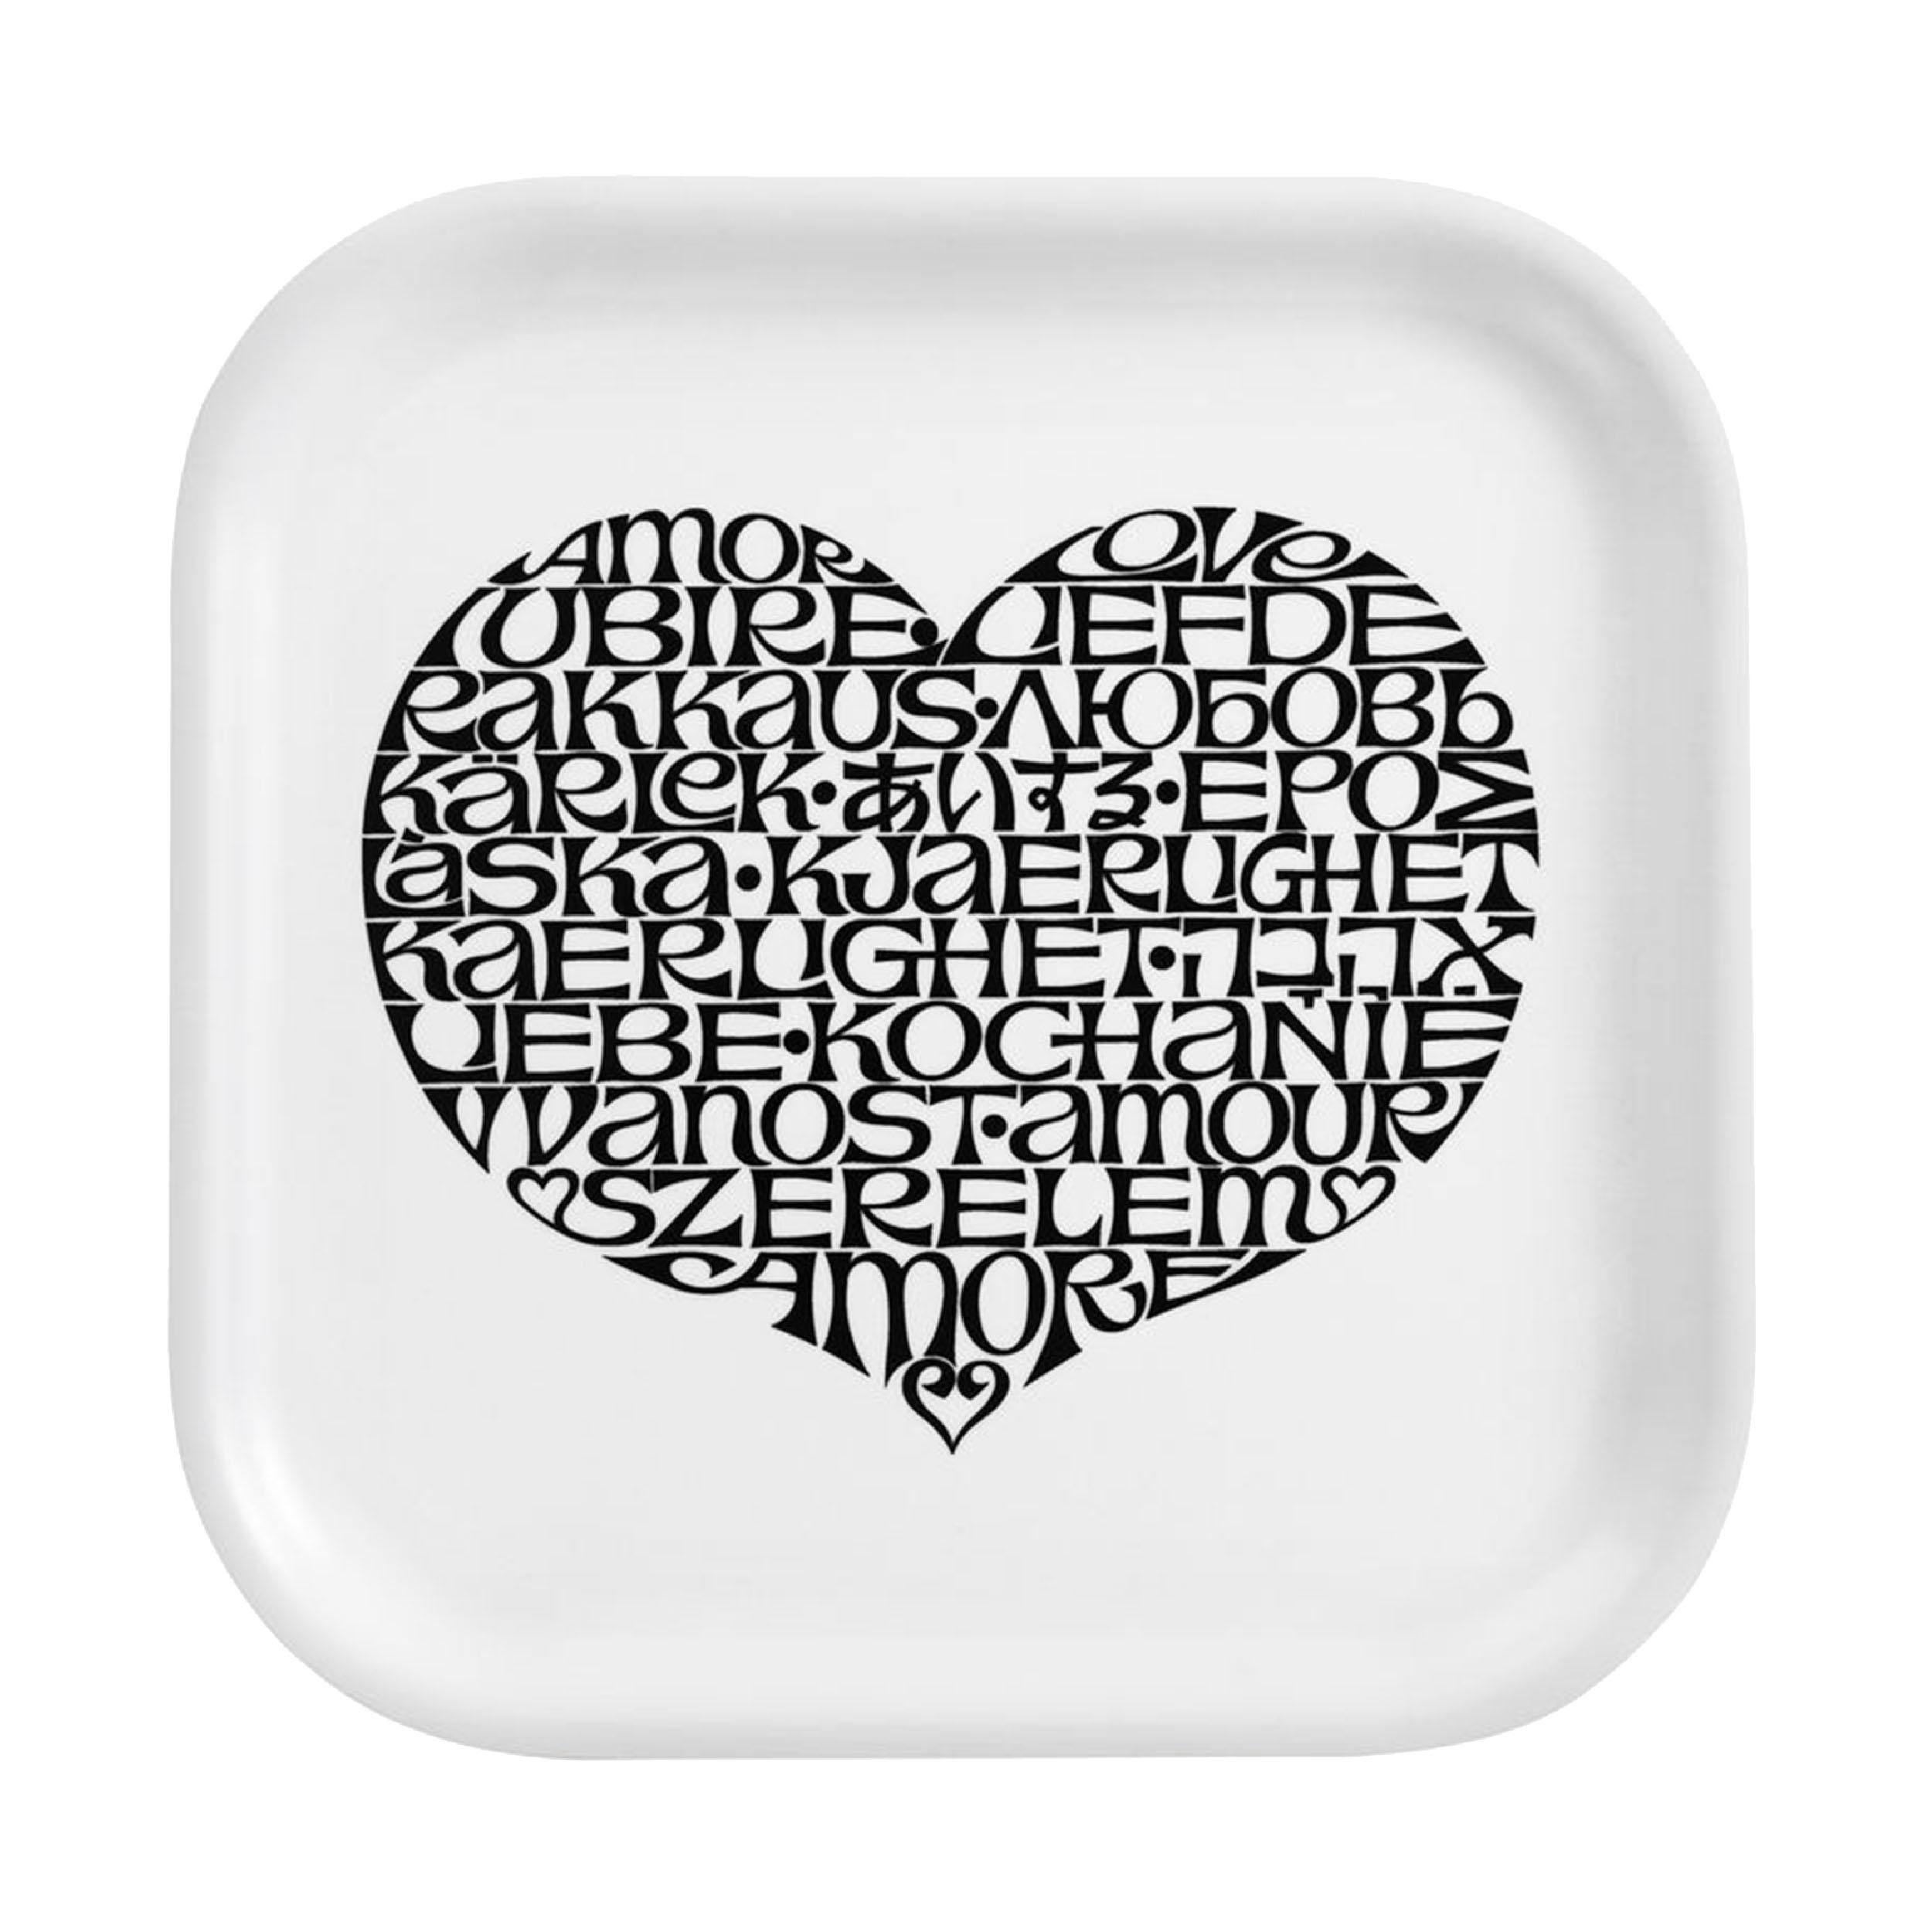 Classic Tray International Love Heart Tablett